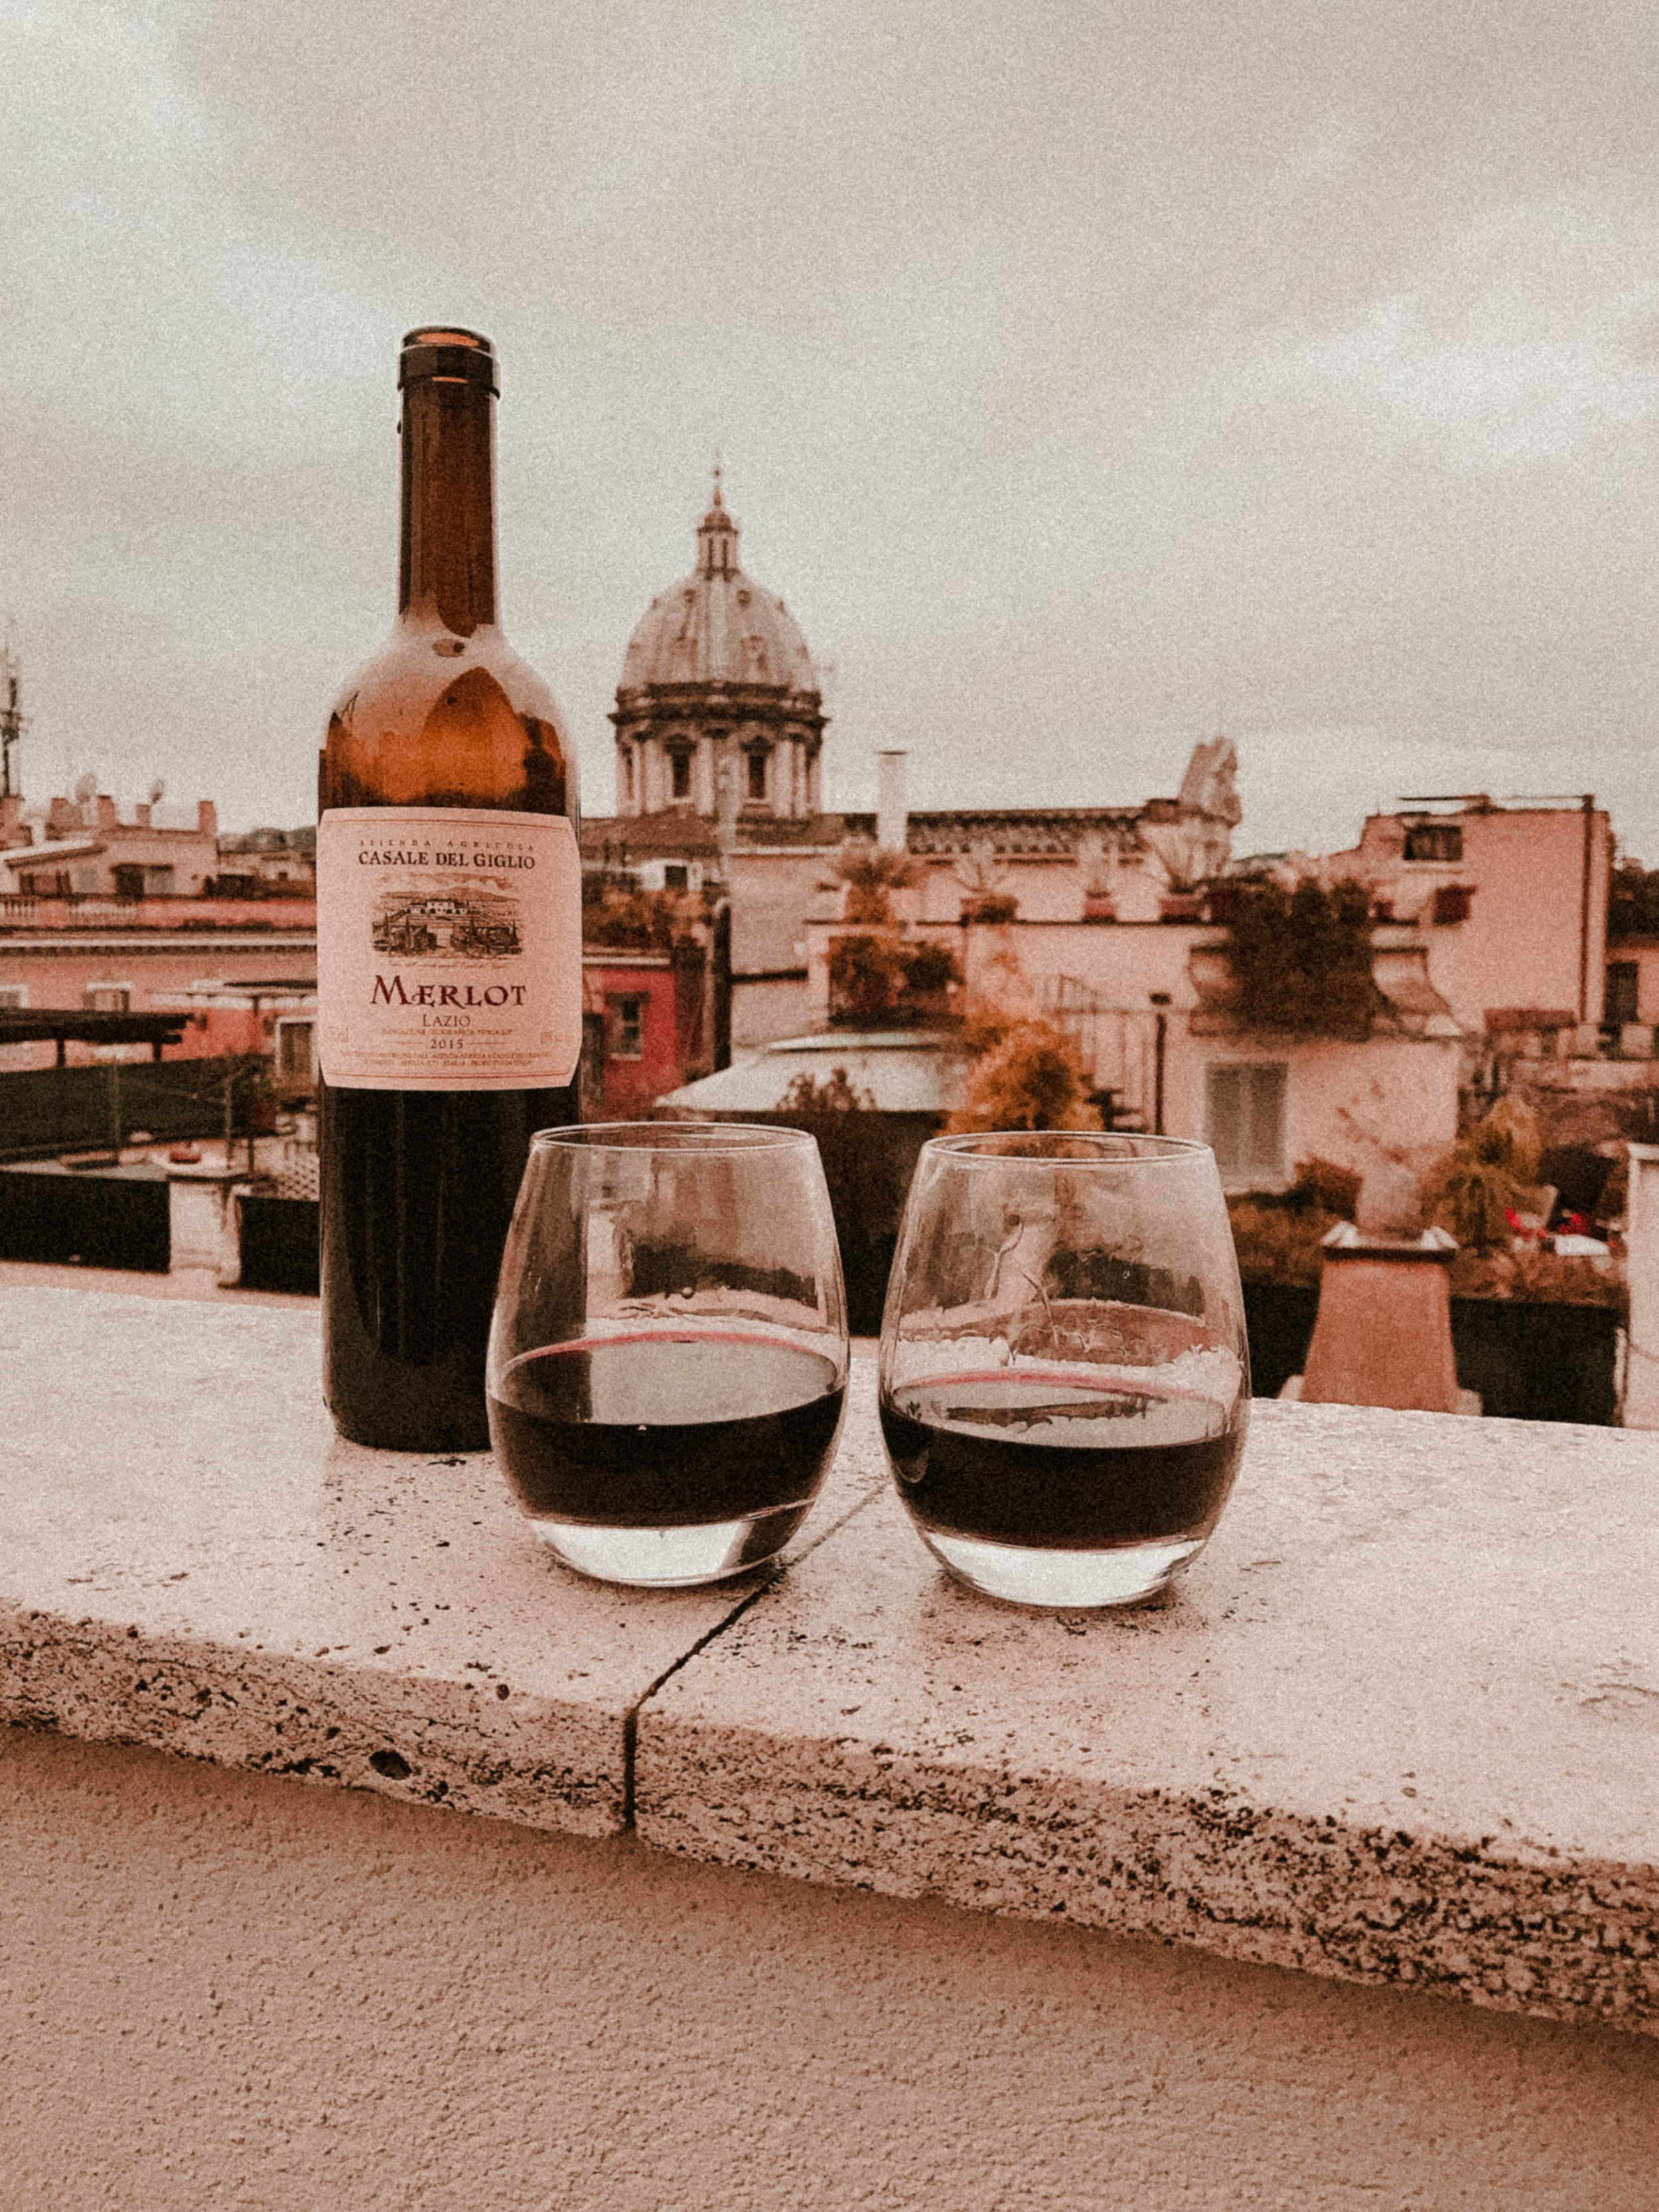 Rush and Teal Rome Travel Journal-33.jpg